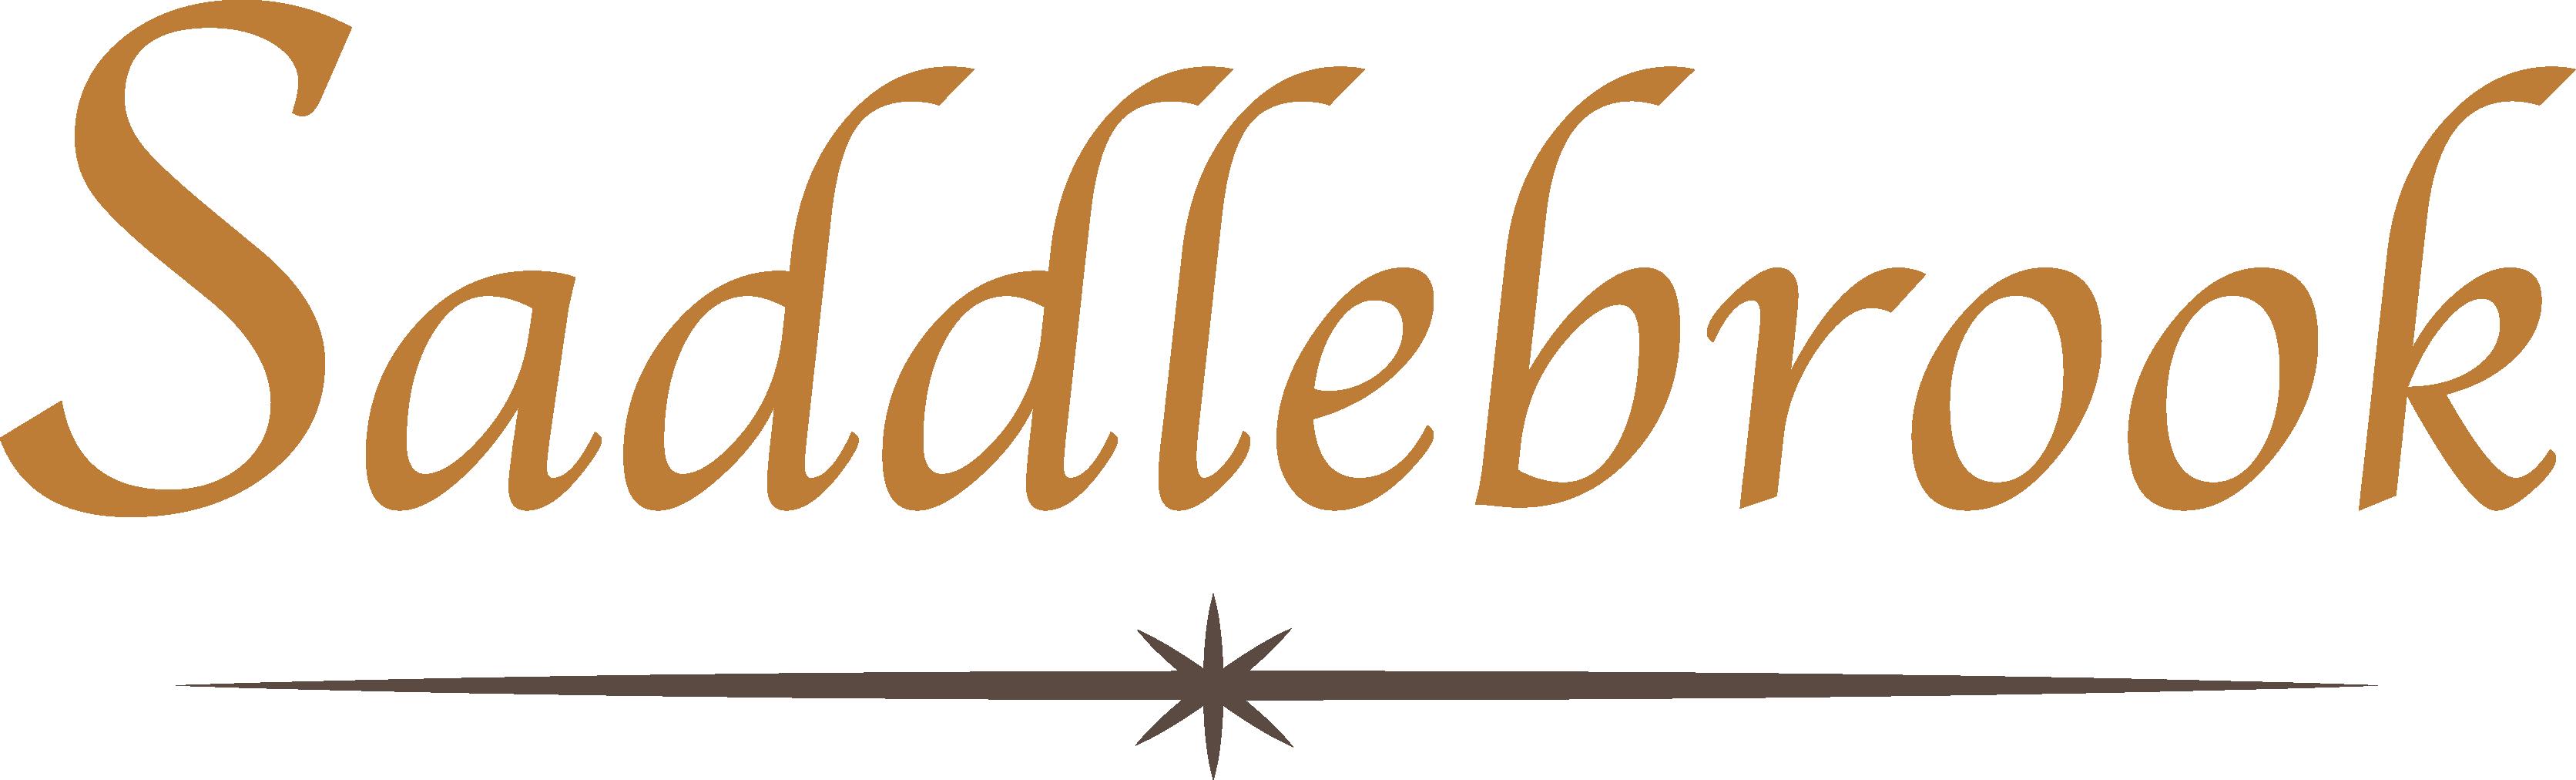 Saddlebrook_Logo 2018_Iver